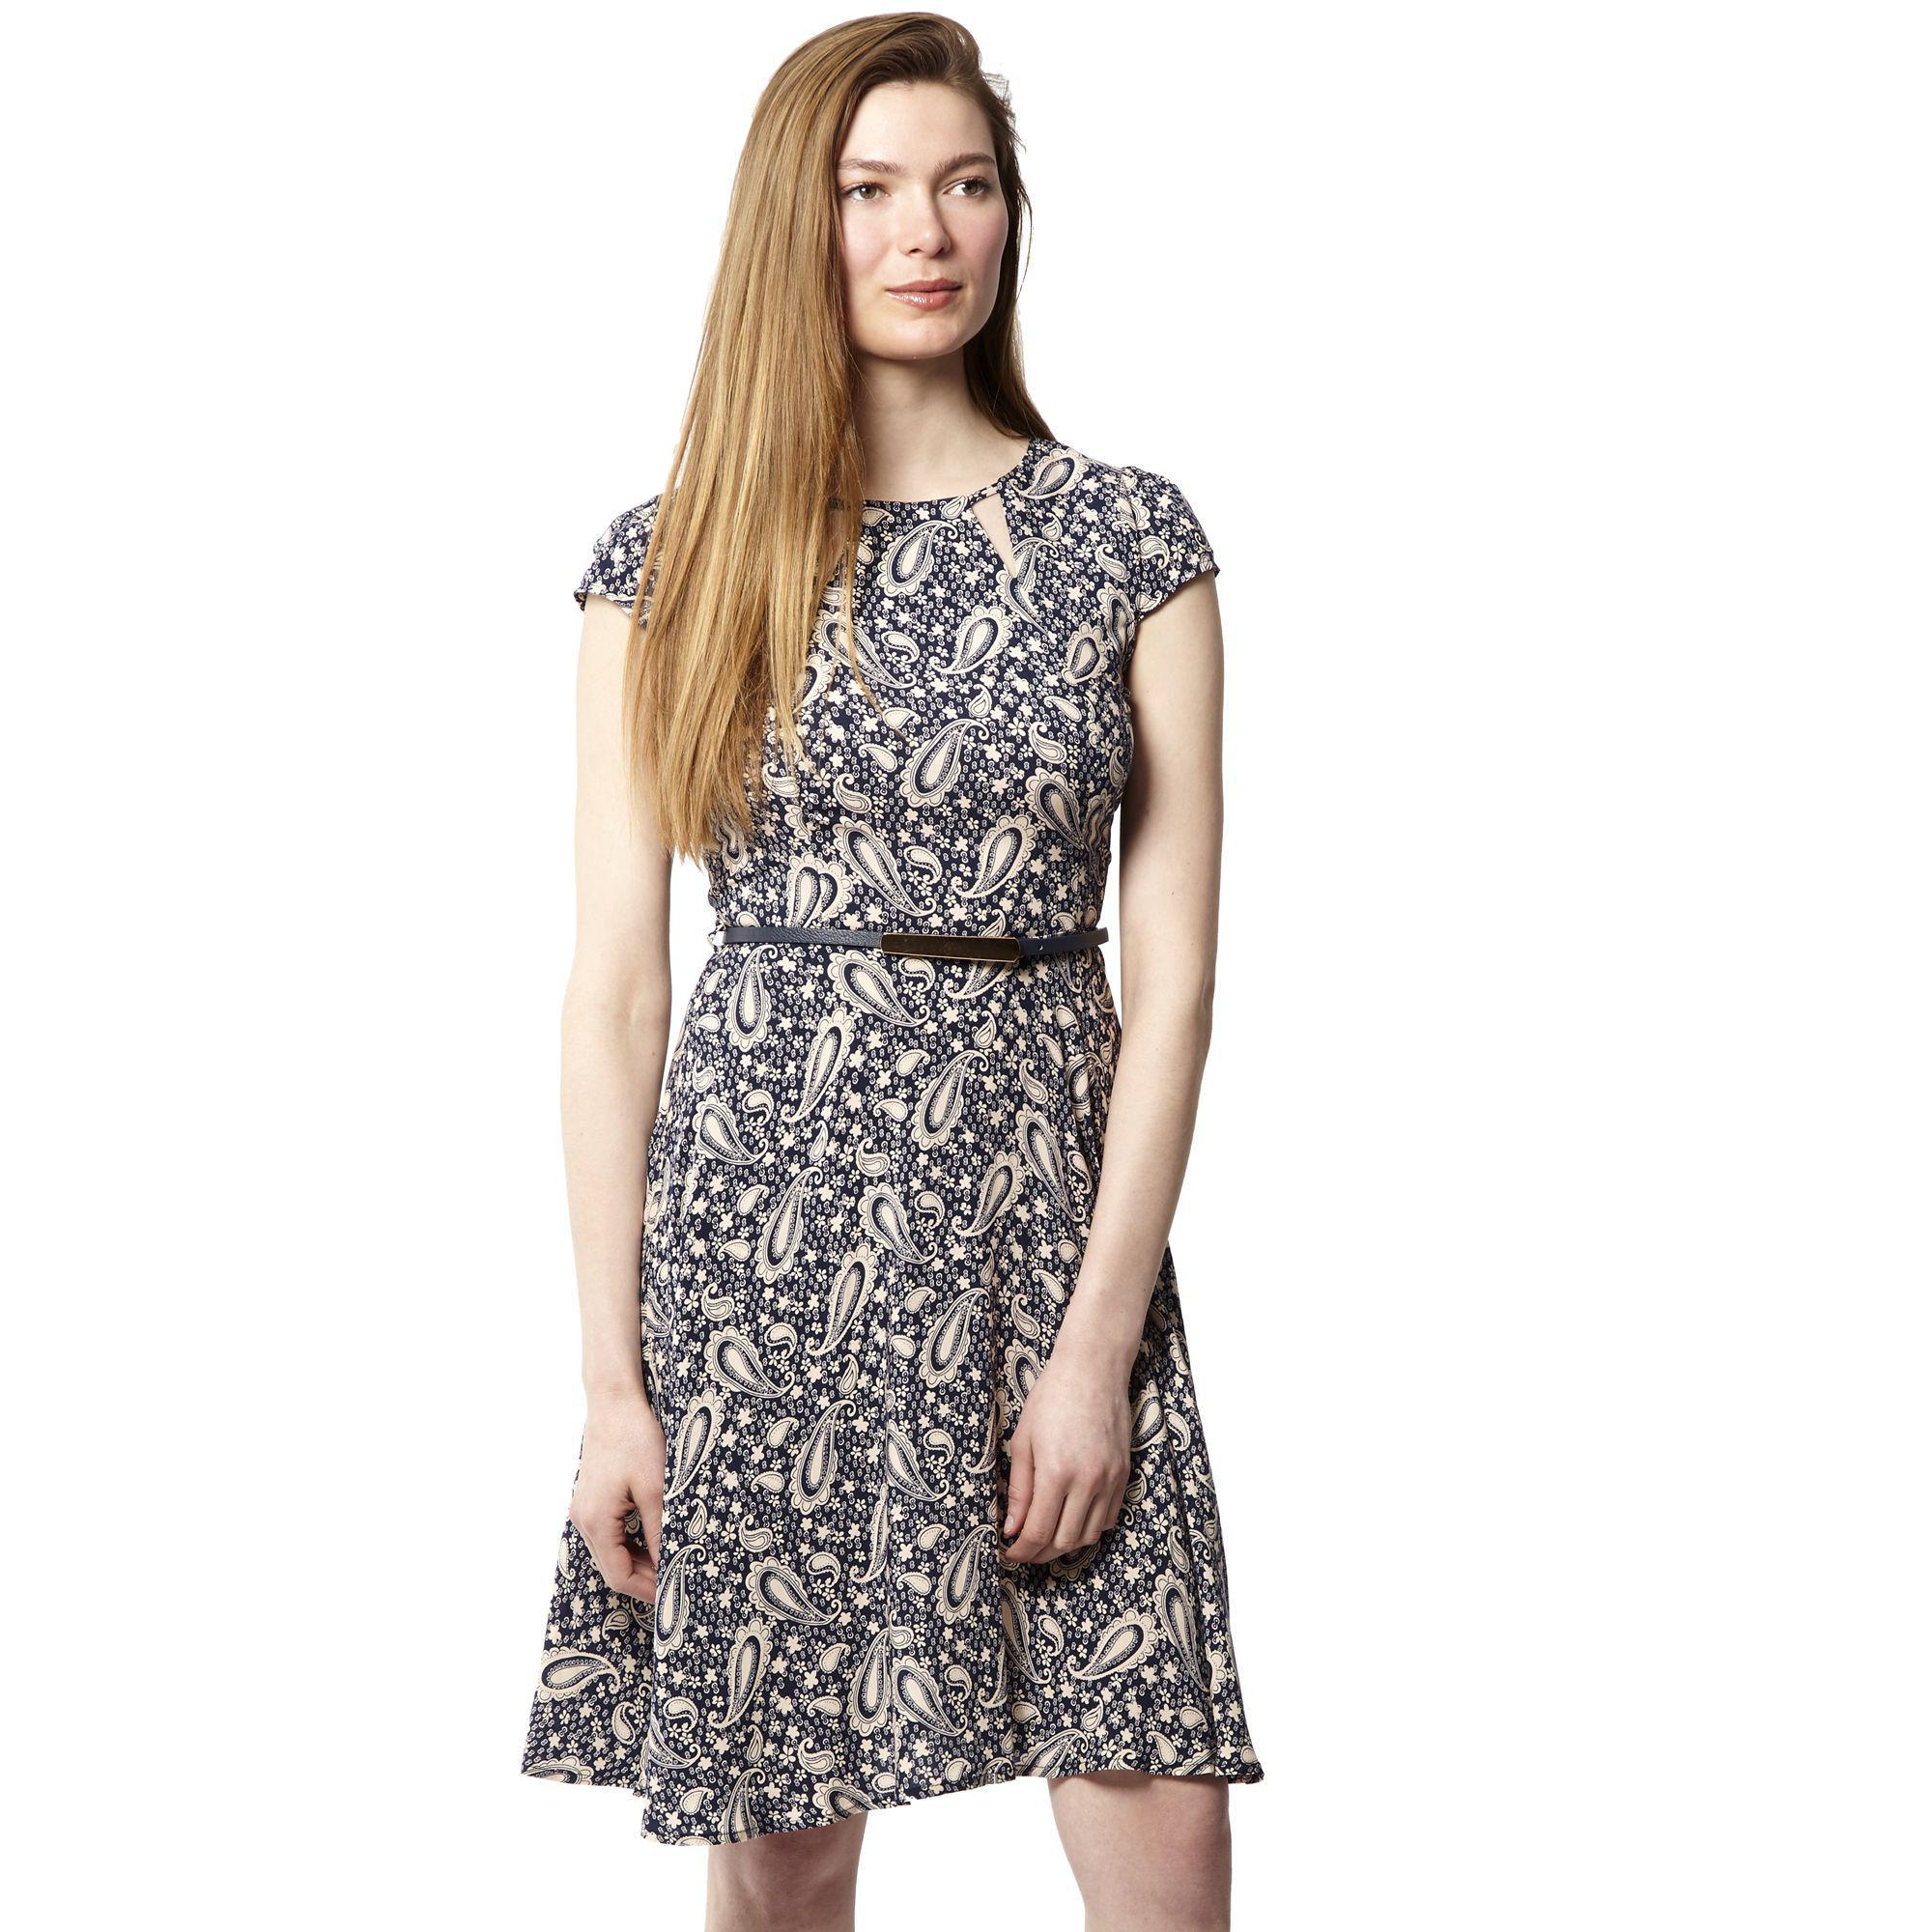 1f45bddffb Izabel London Navy Paisley Print Belted Skater Dress in Blue - Lyst